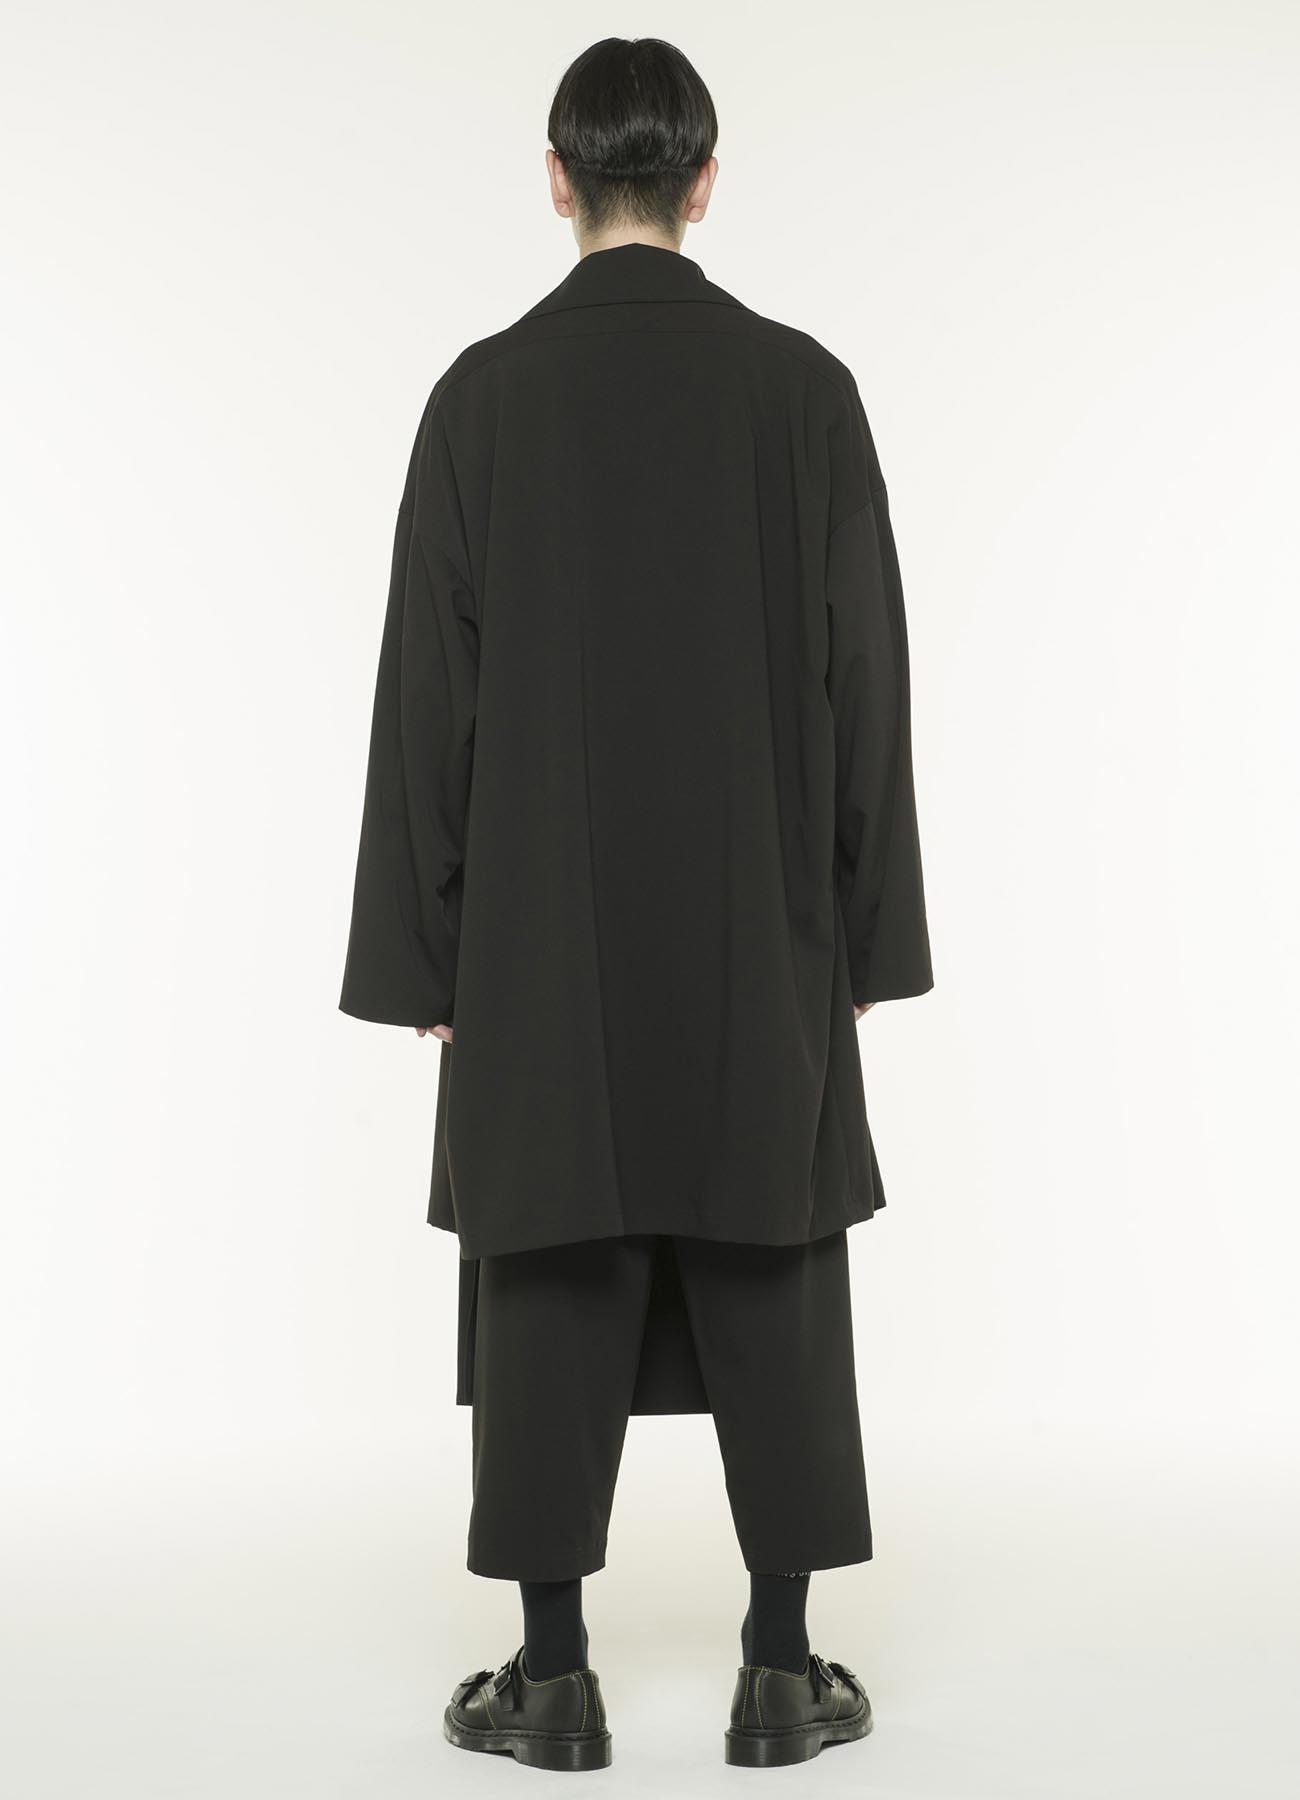 Pe / 人造丝轧别丁弹性框架双领垂褶外套